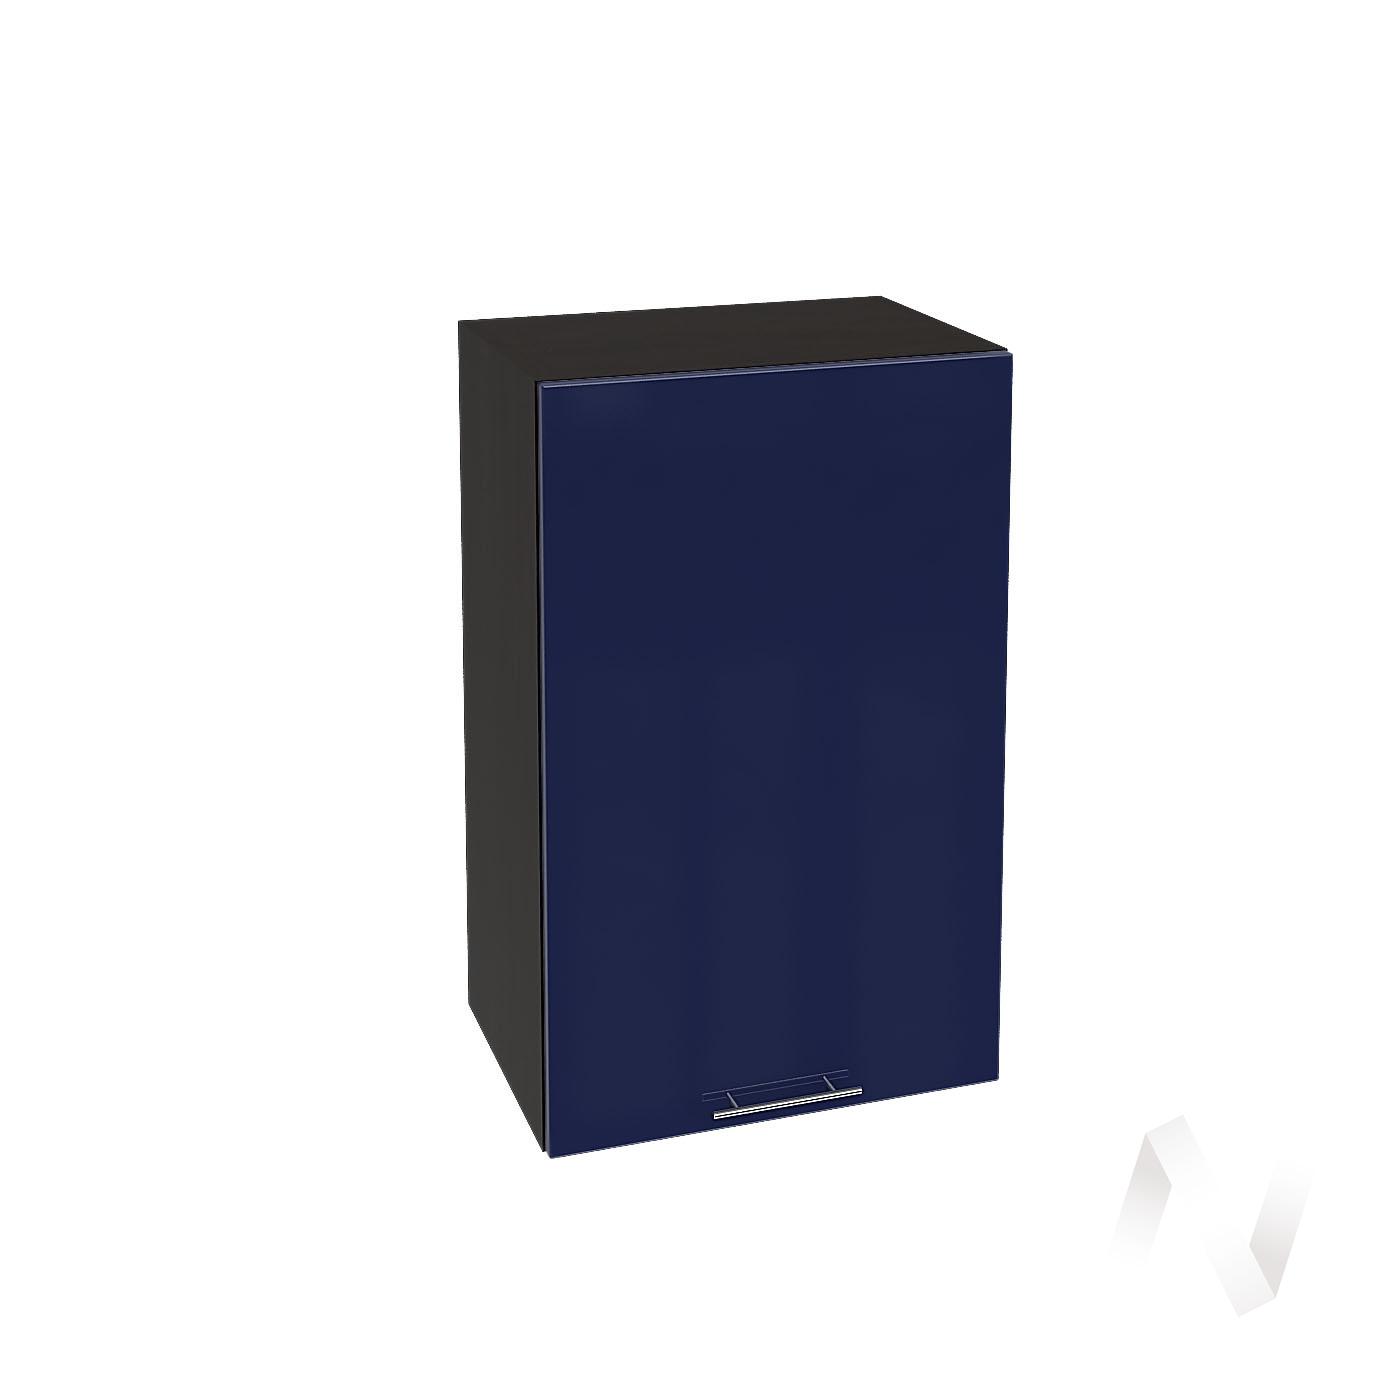 "Кухня ""Валерия-М"": Шкаф верхний 450, ШВ 450 (Синий глянец/корпус венге)"